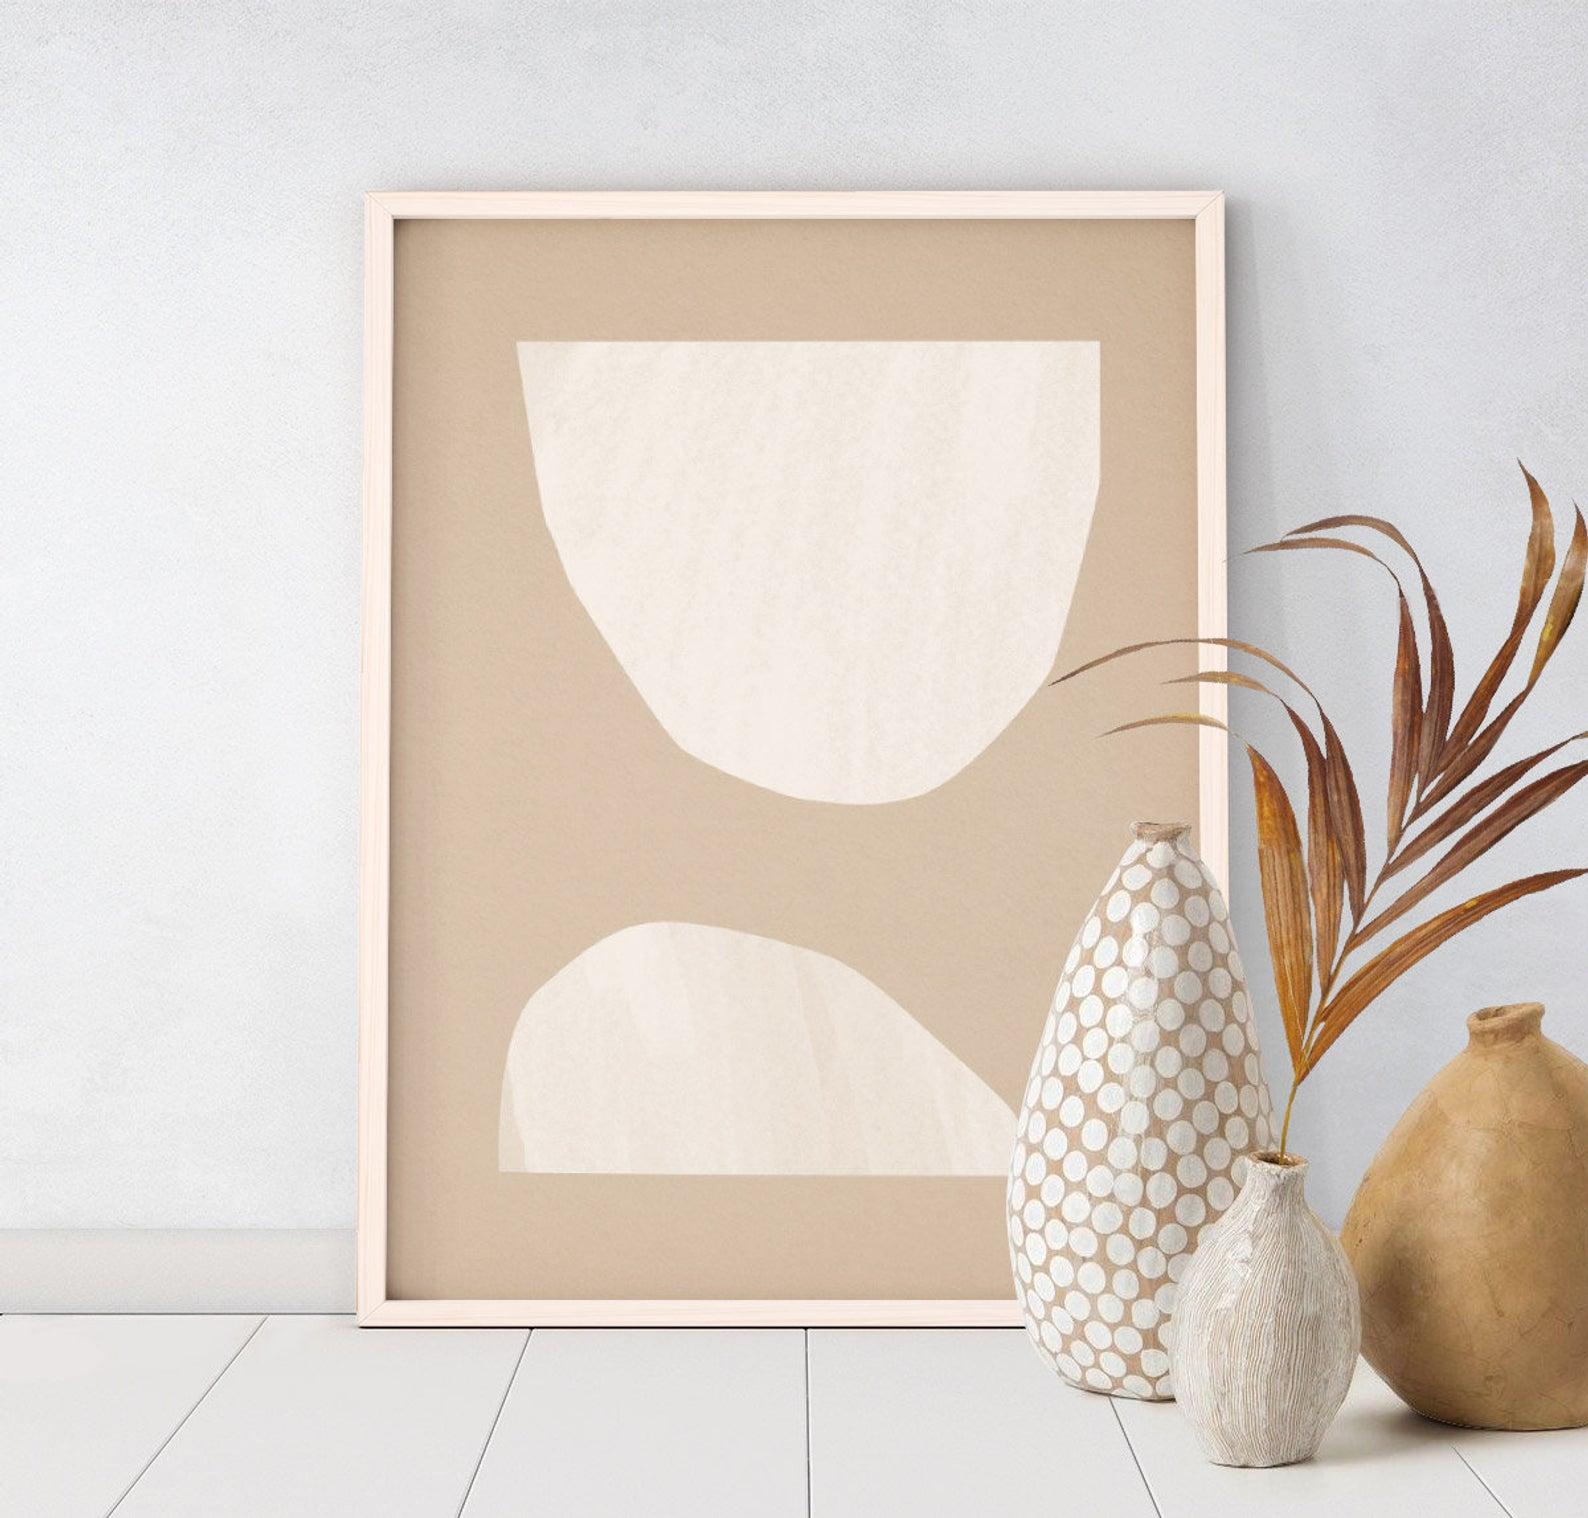 Minimalist Beige Art Downloadable Print Printable Modern Etsy In 2021 Beige Art Geometric Art Prints Downloadable Print